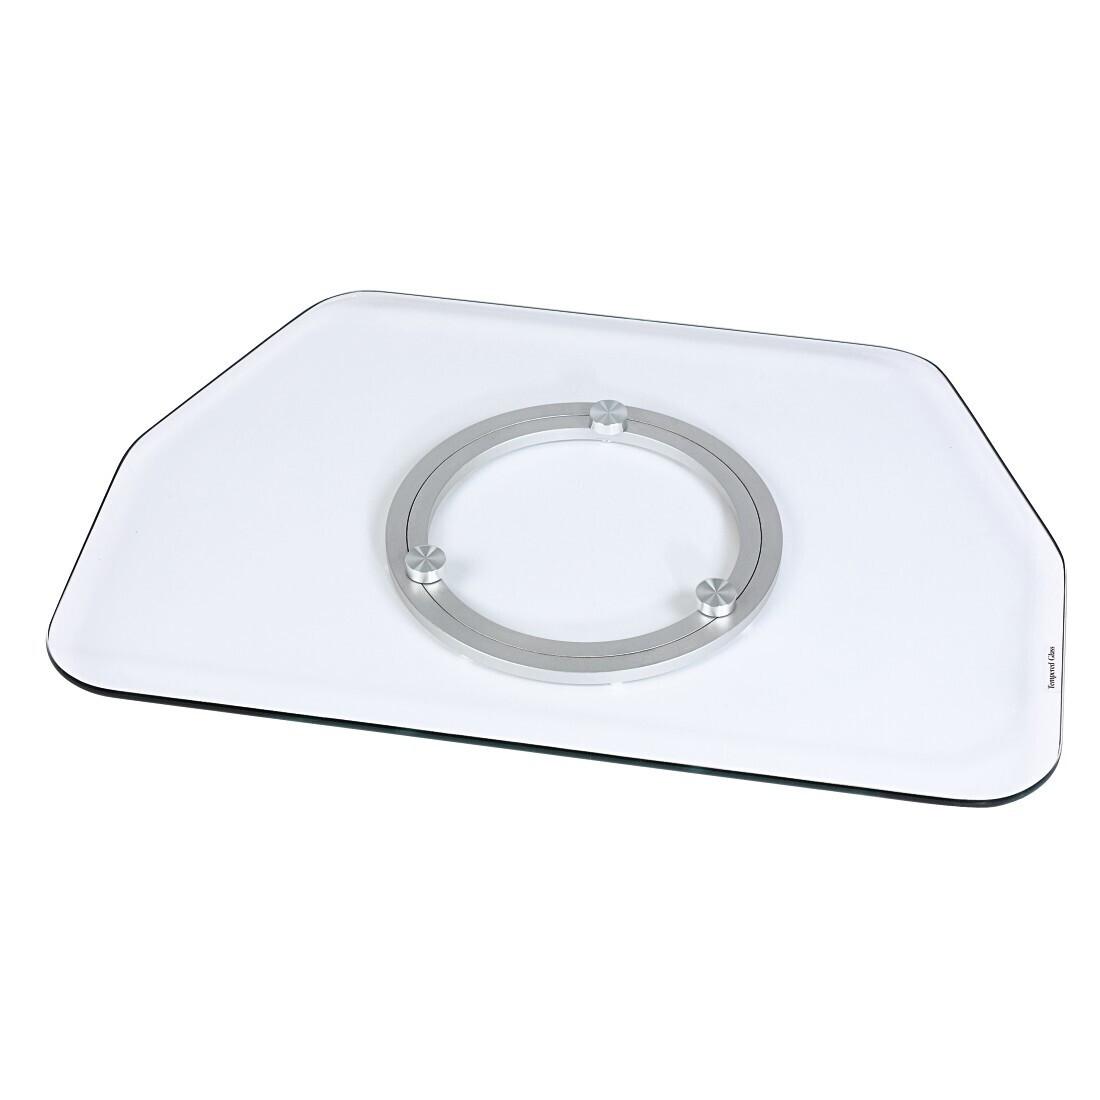 Hama LCD-/Plasma-TV-Drehteller, Glas, Klar,  bis 42